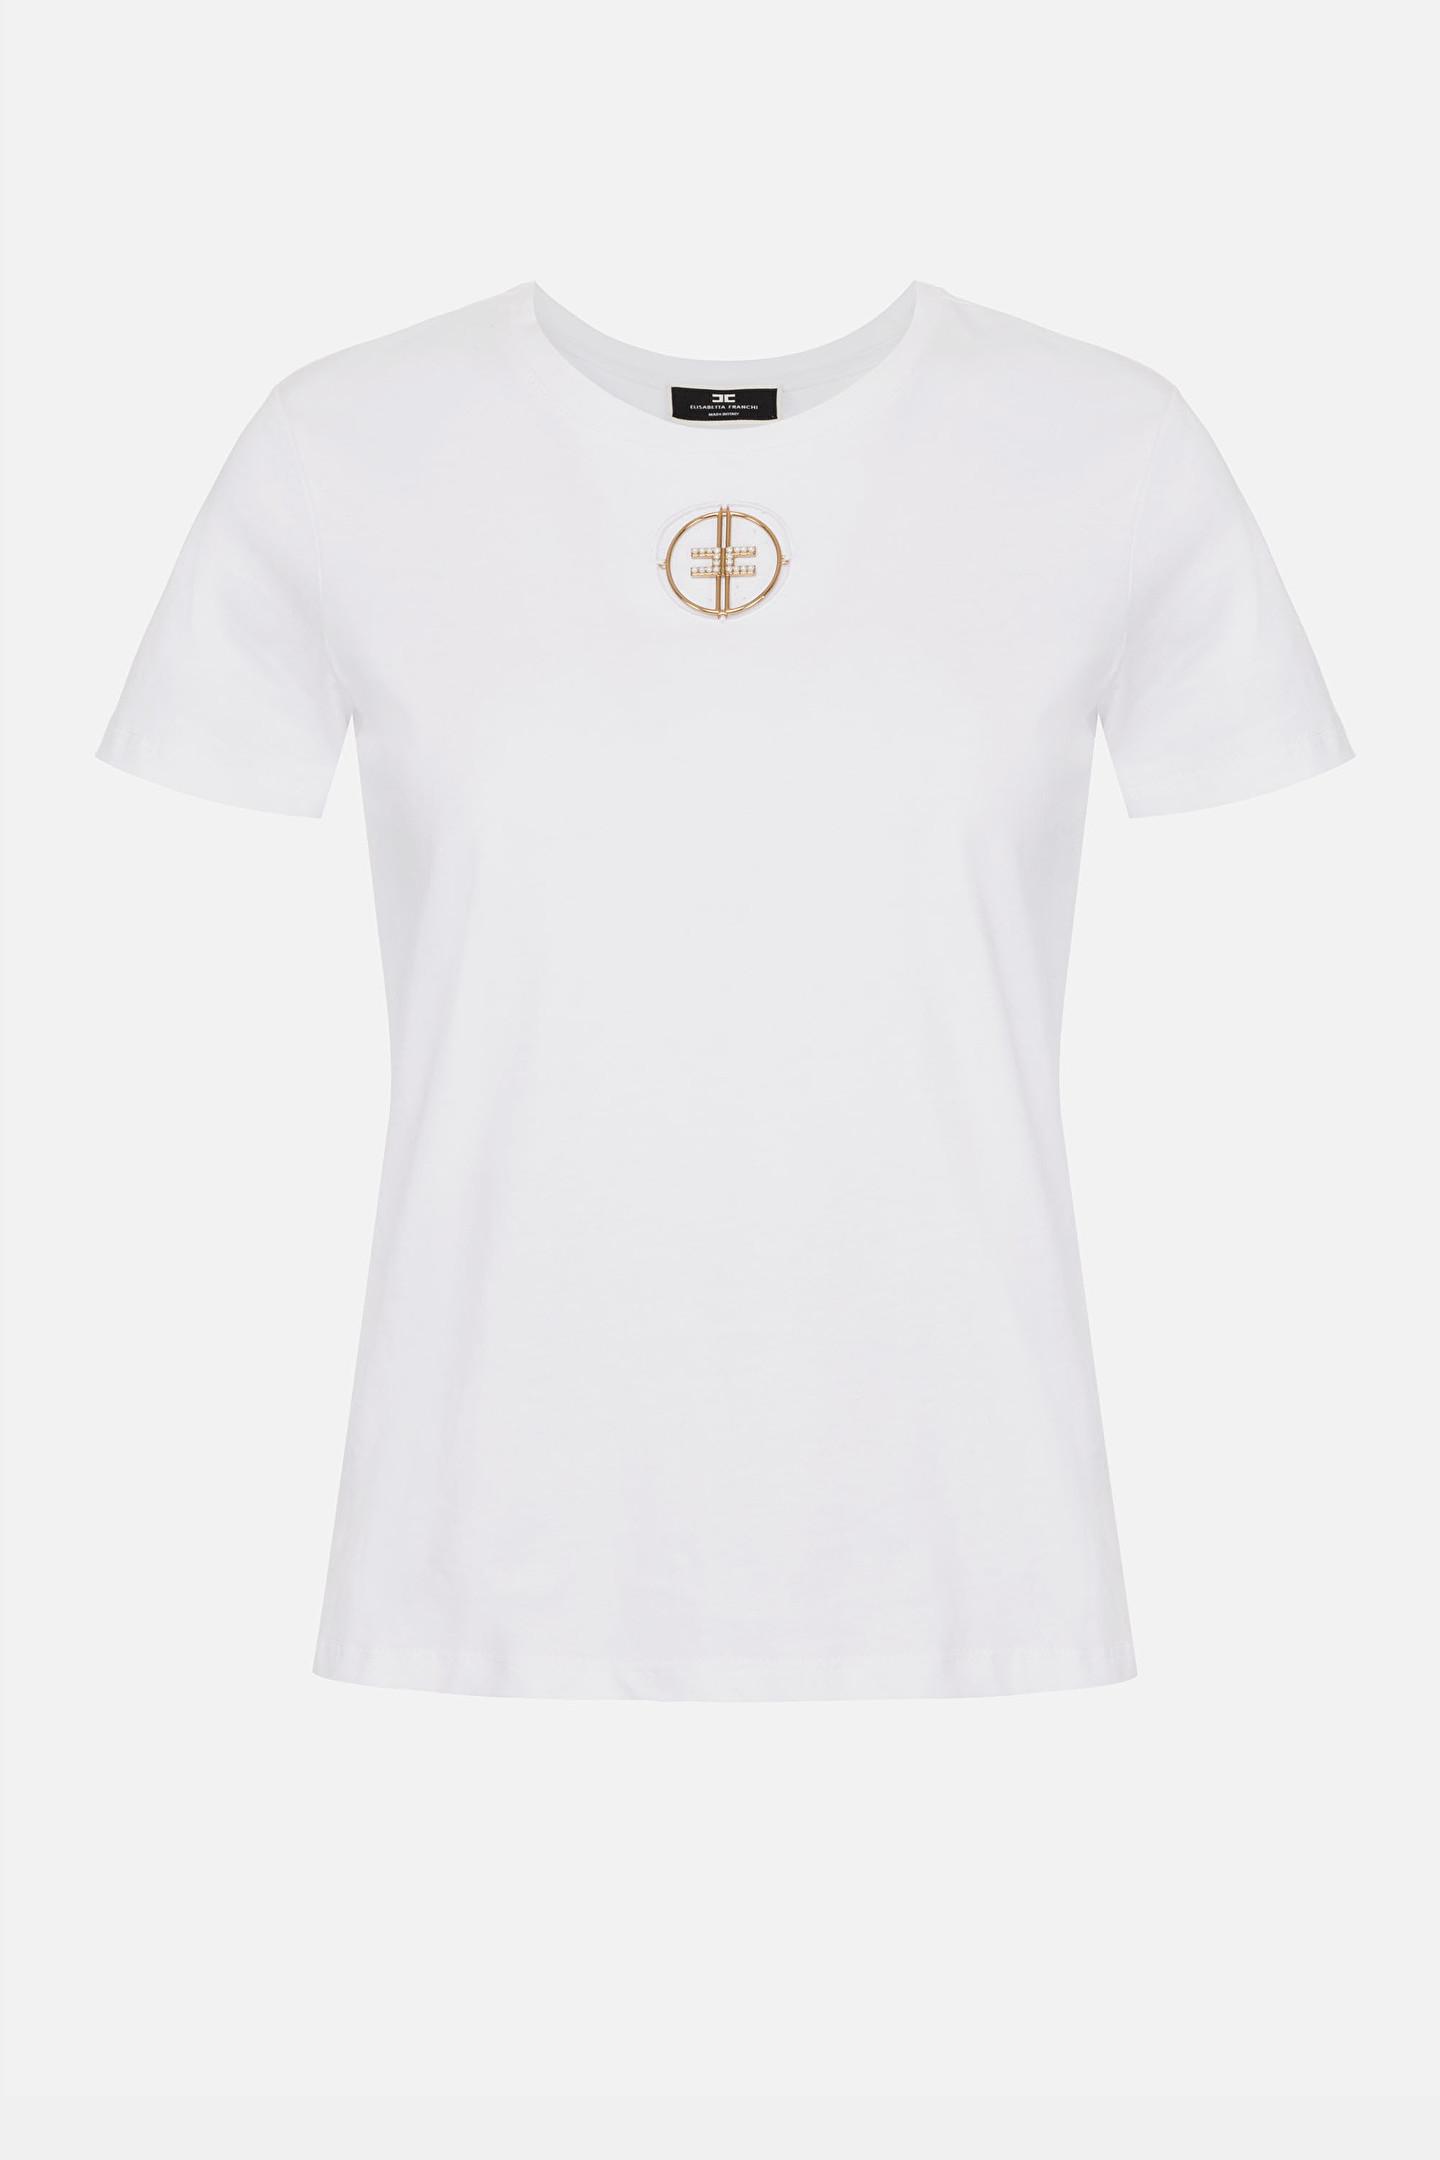 T-shirt Elisabetta Franchi con logo in strass ricamato ELISABETTA FRANCHI | T-shirt | MA25N11E2270